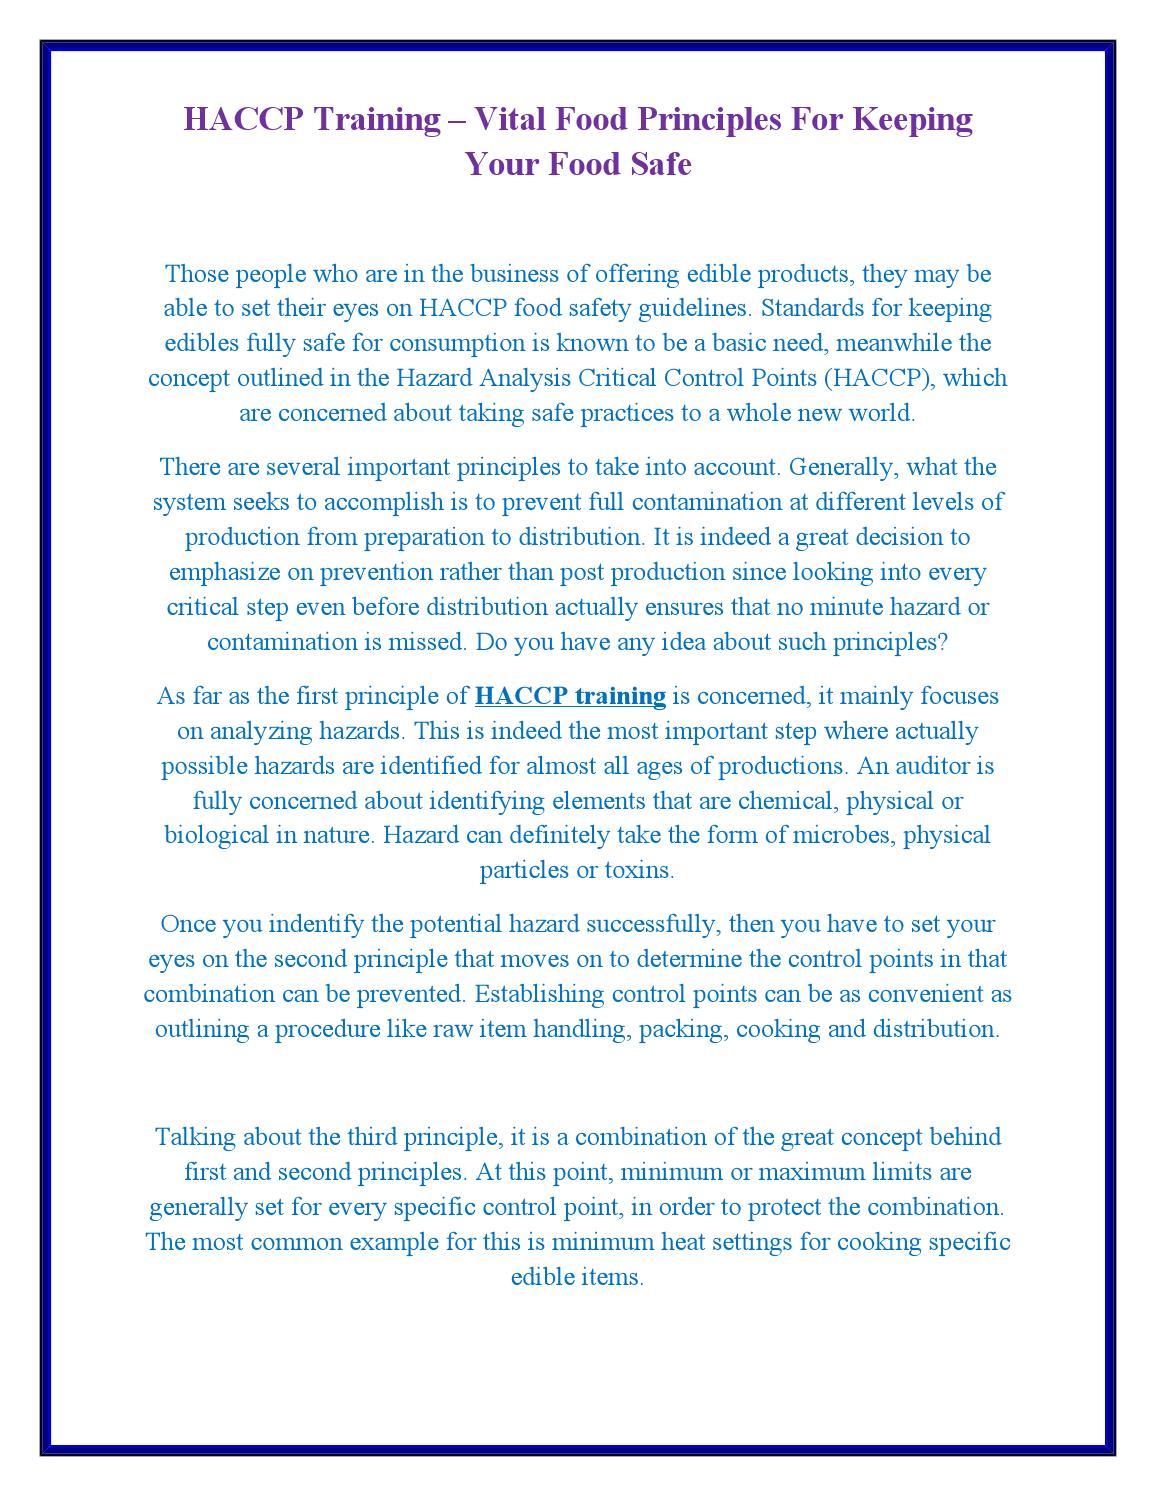 Haccp training vital food principles for keeping your food safe by haccp training vital food principles for keeping your food safe by thomas klinger issuu altavistaventures Image collections